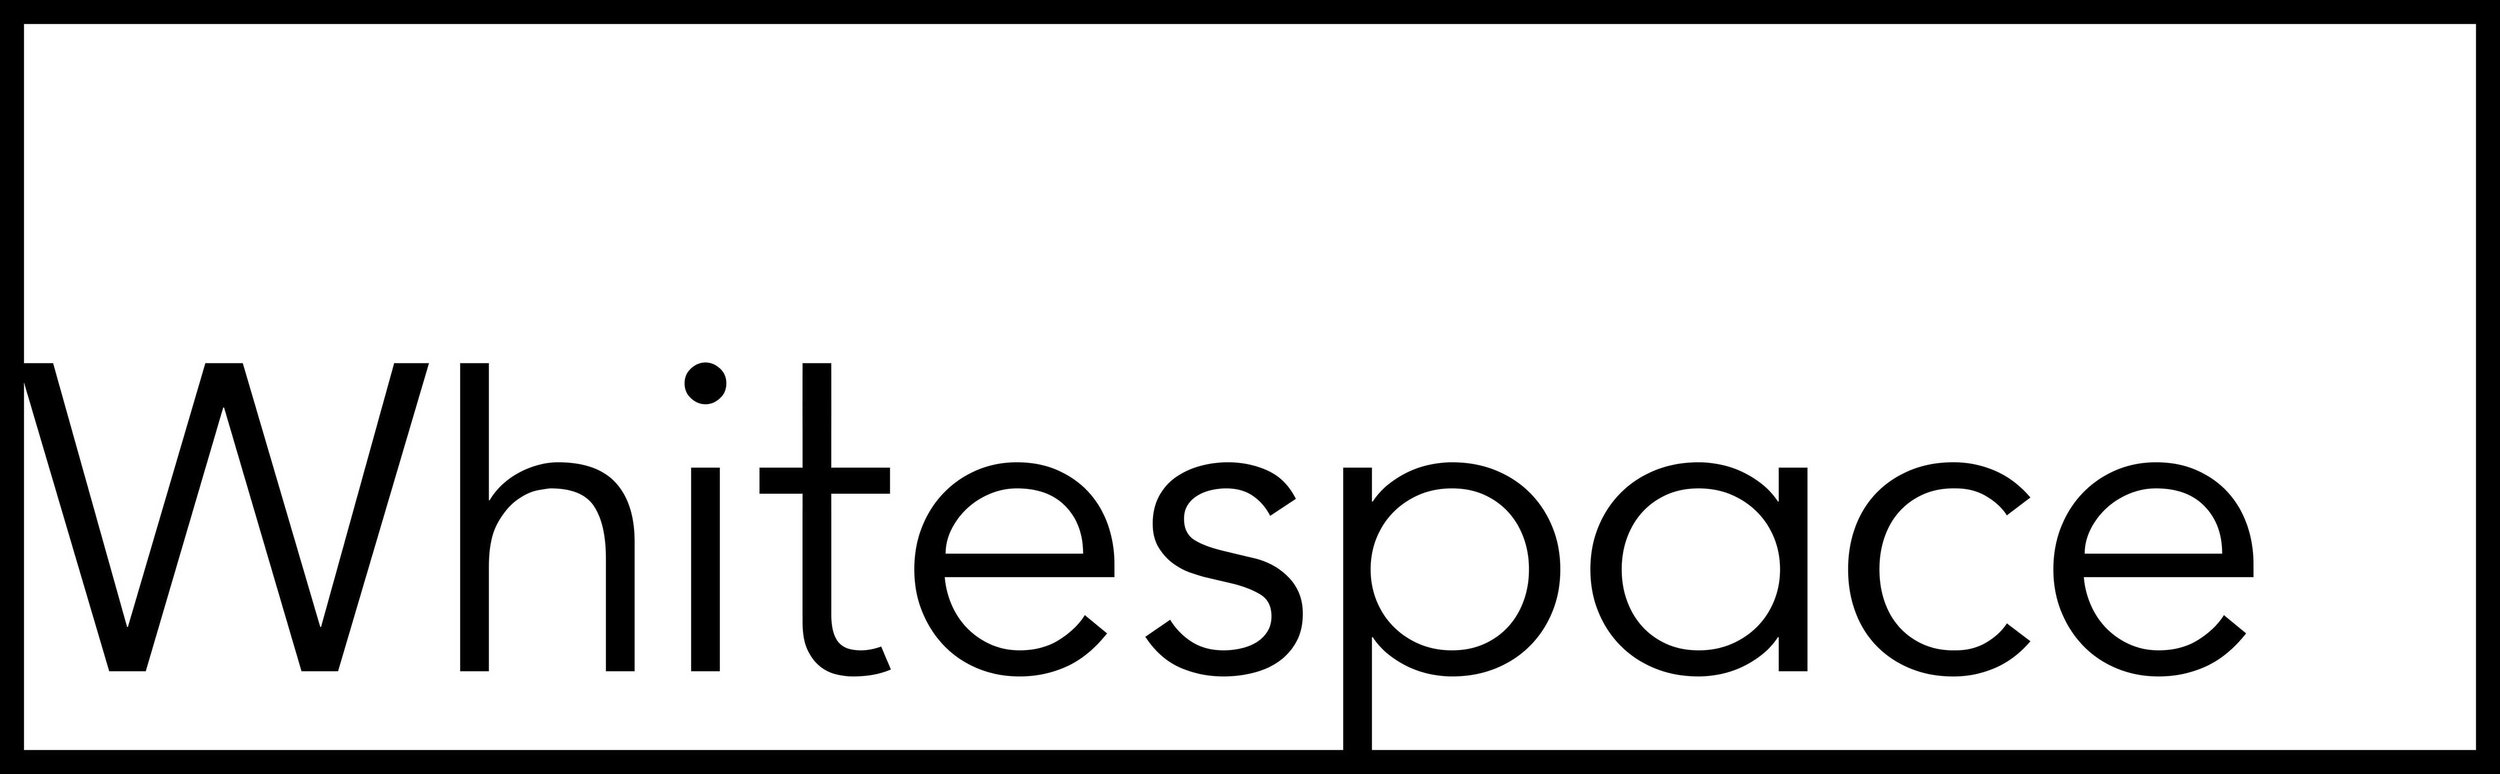 logo_blackonwhite.jpg